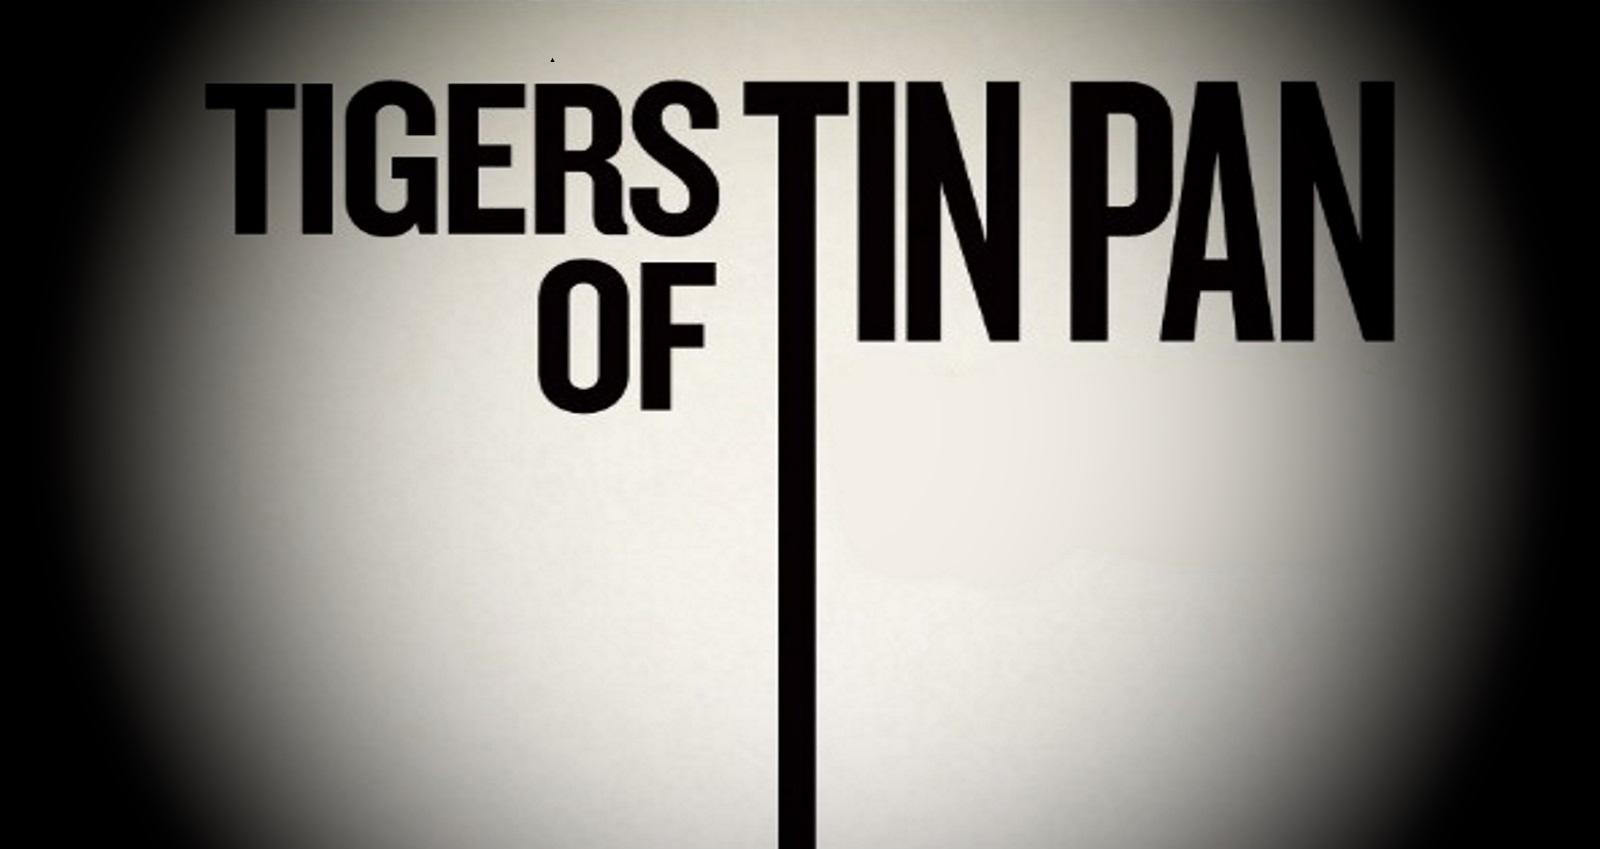 Tigers-of-Tin-Pan-Cover-Art-proper-size2-vignette